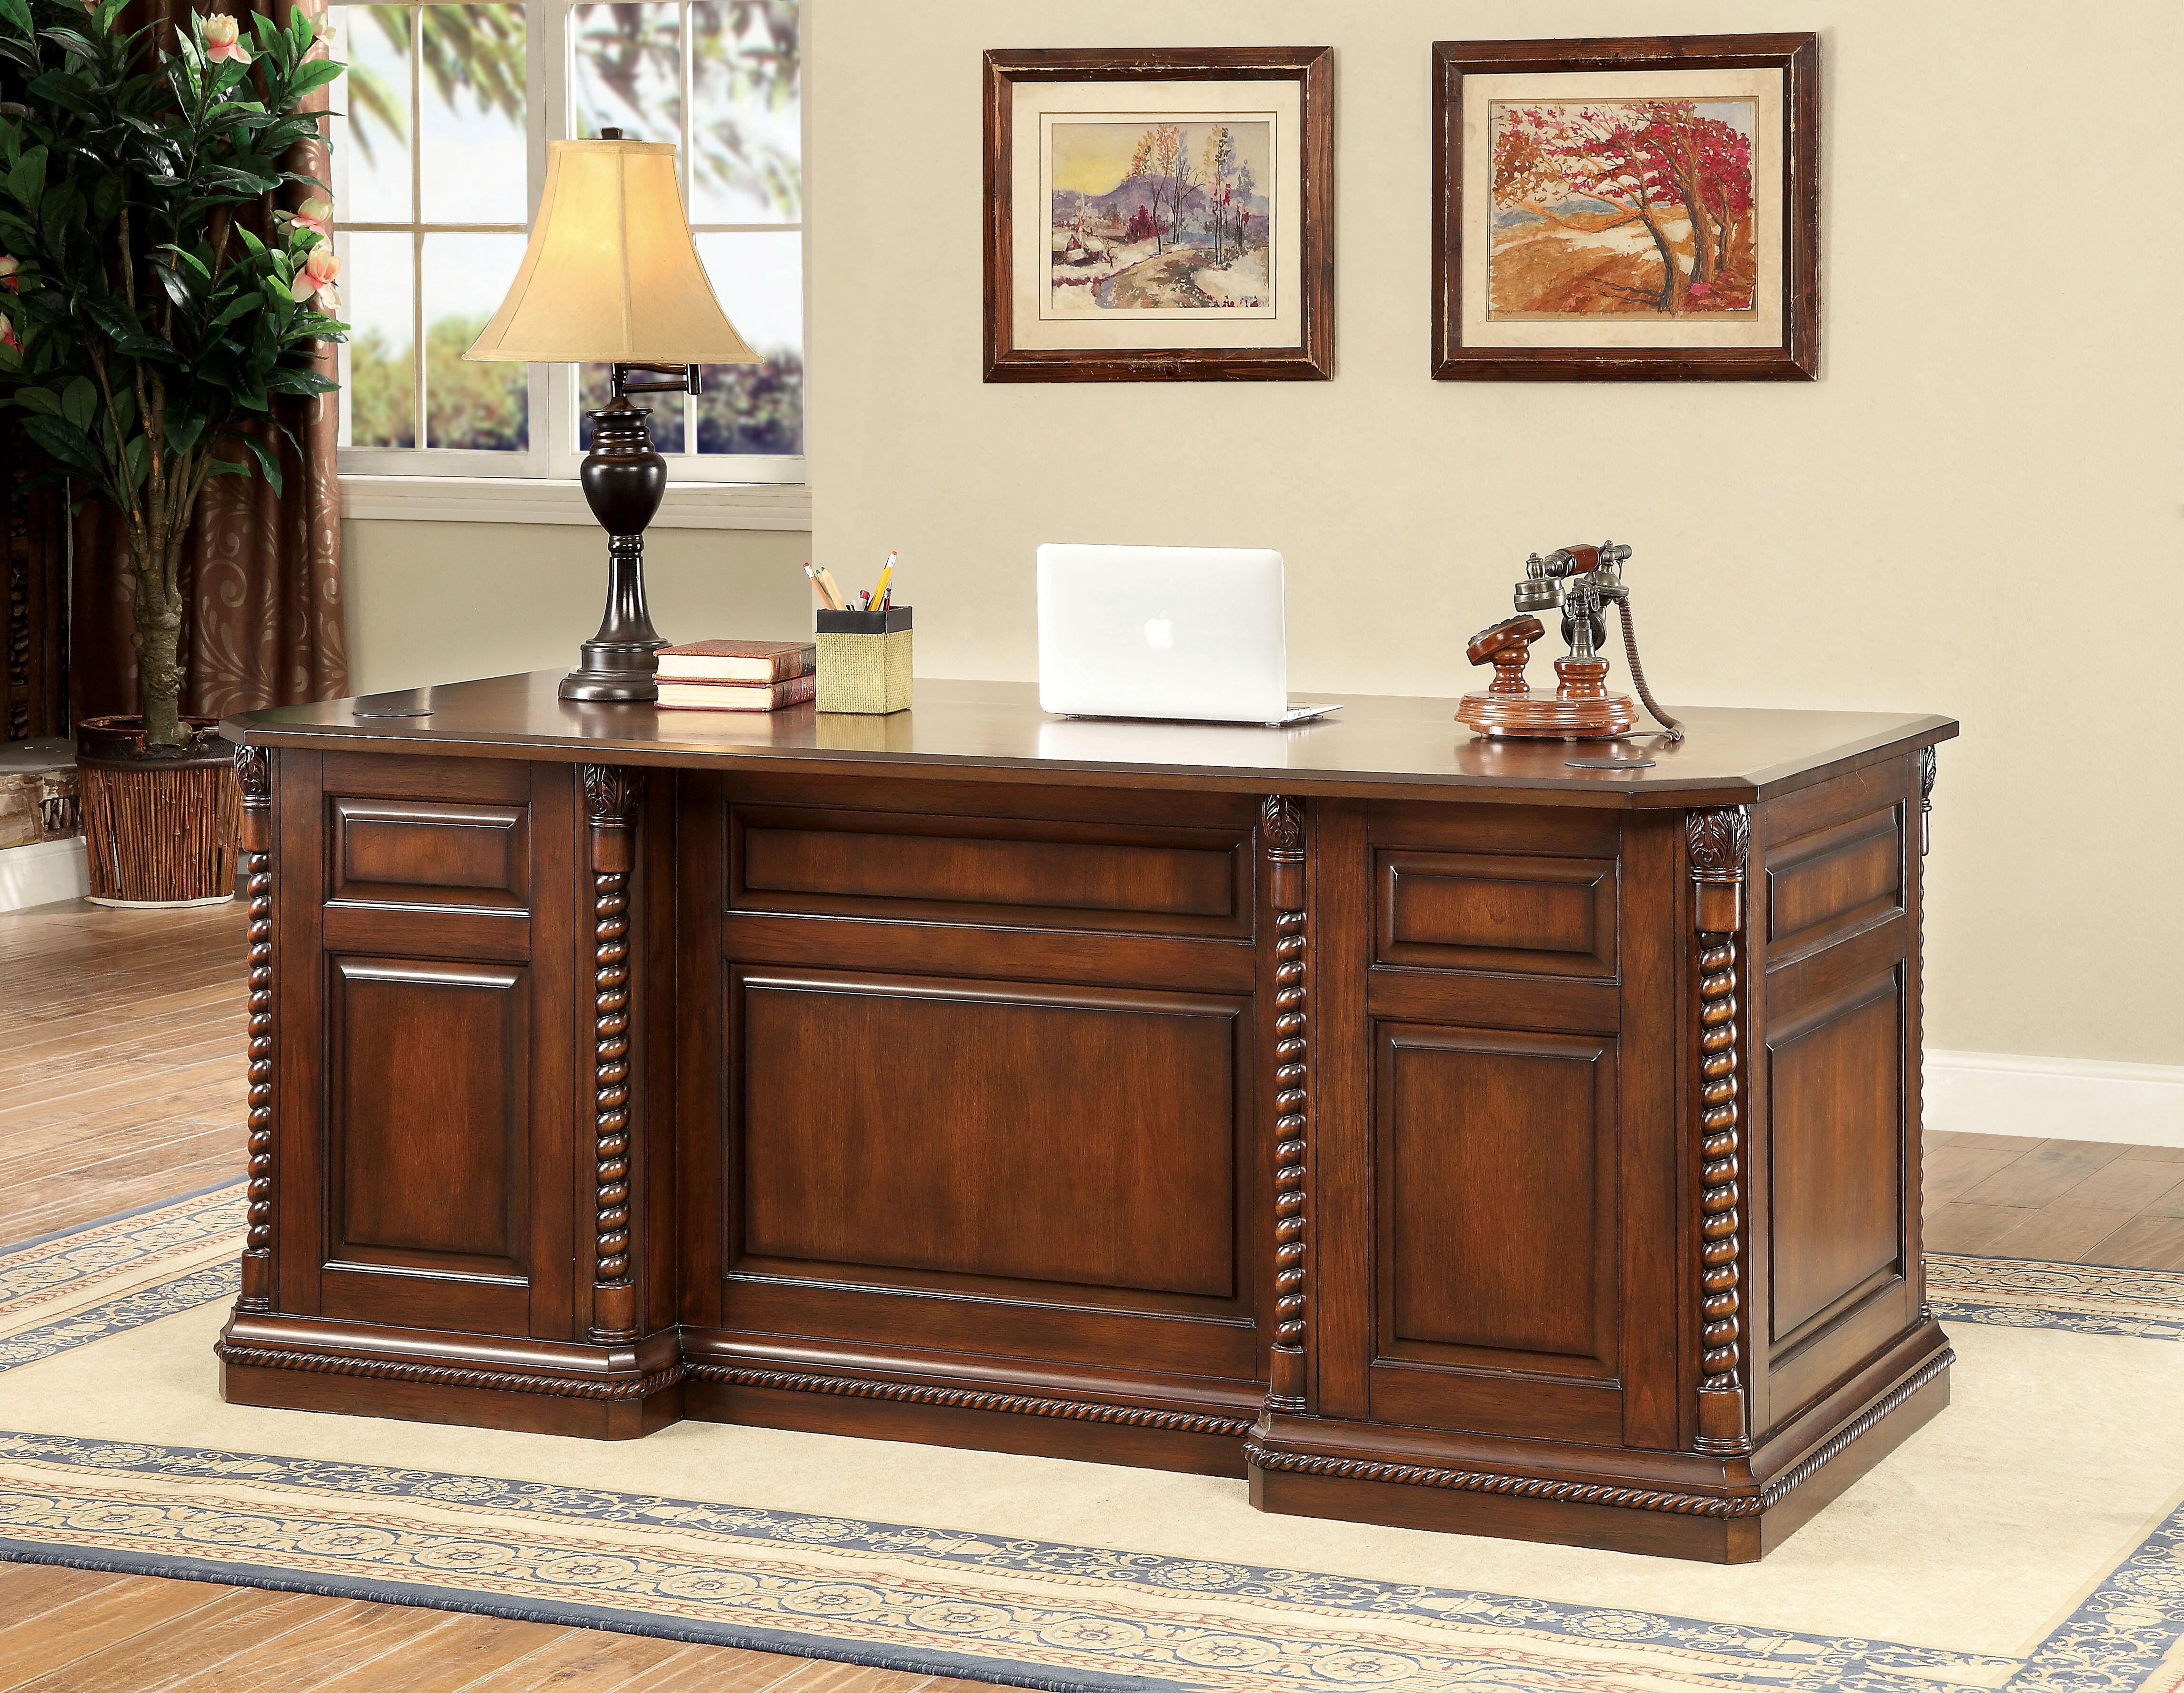 Gentil Darby Home Co Ardnaglass Traditional Dark Oak Executive Desk | Wayfair